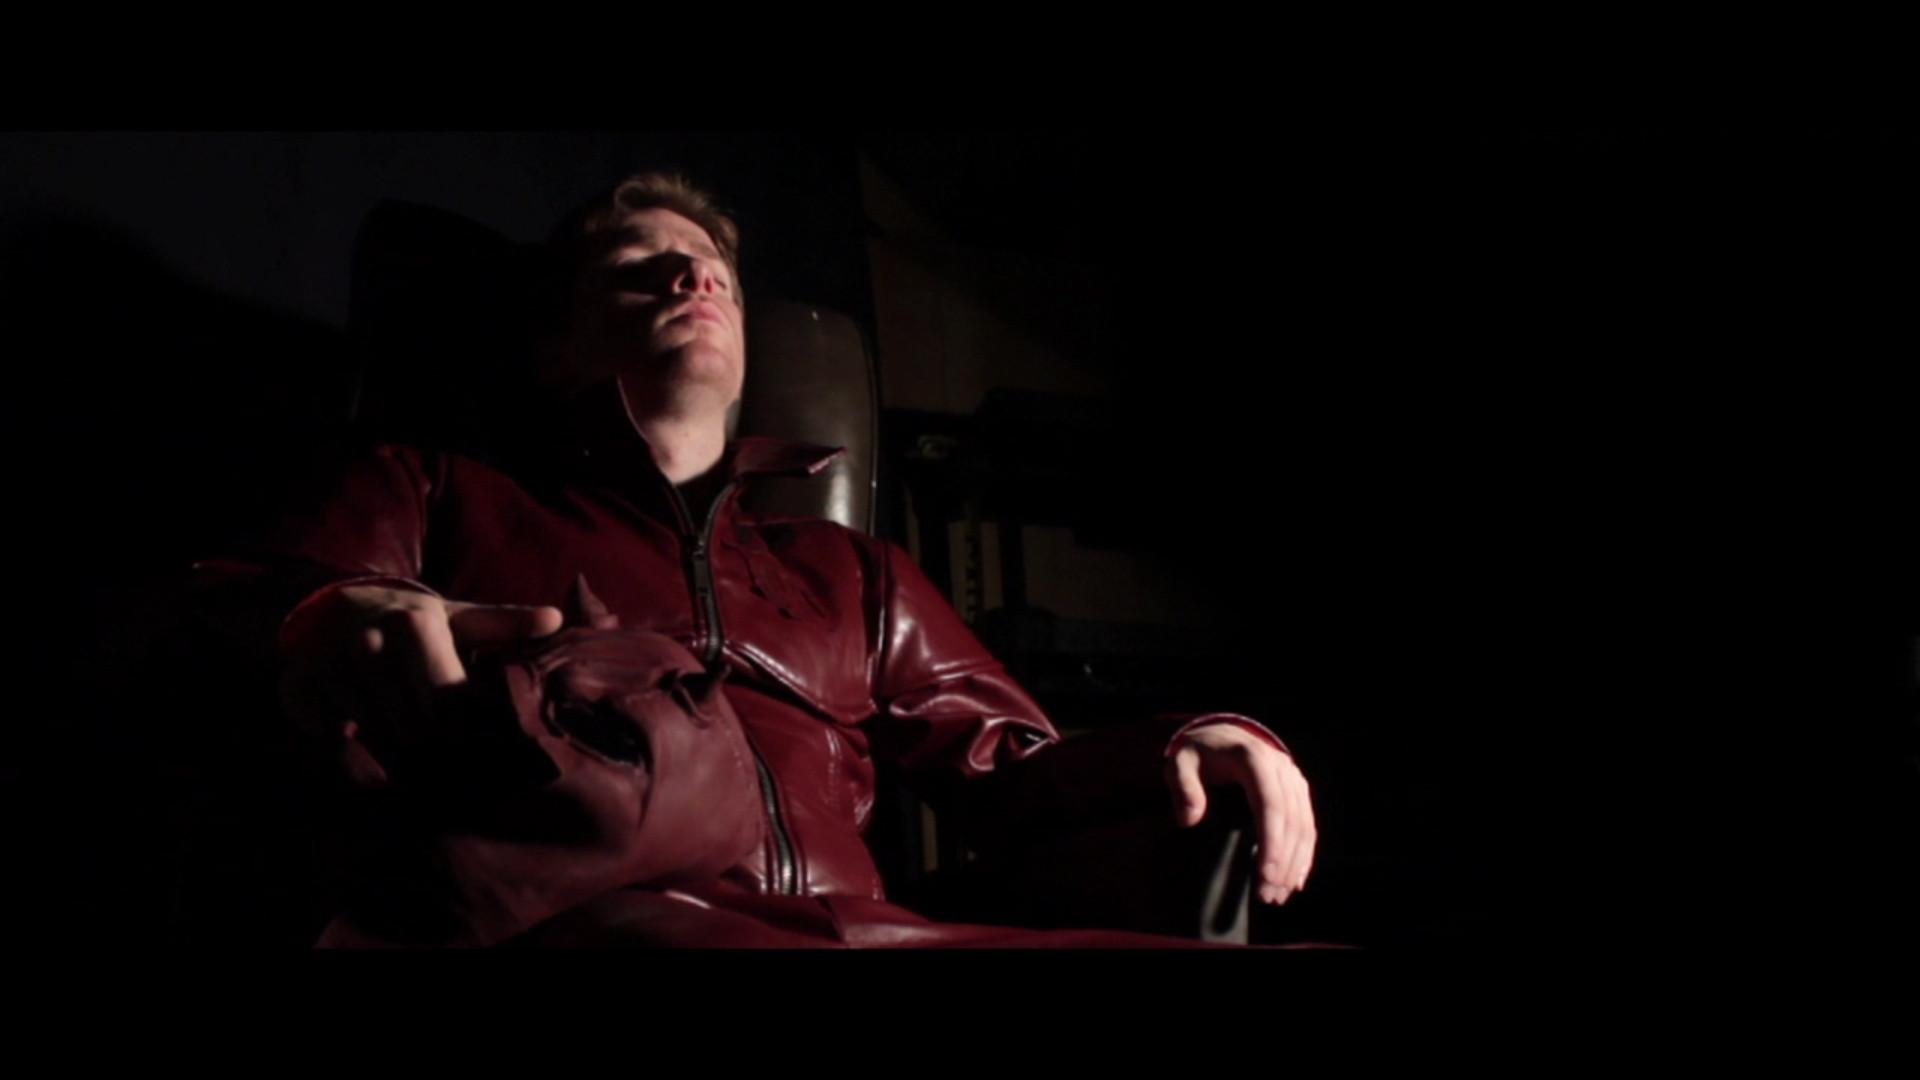 Will Devokees as Daredevil